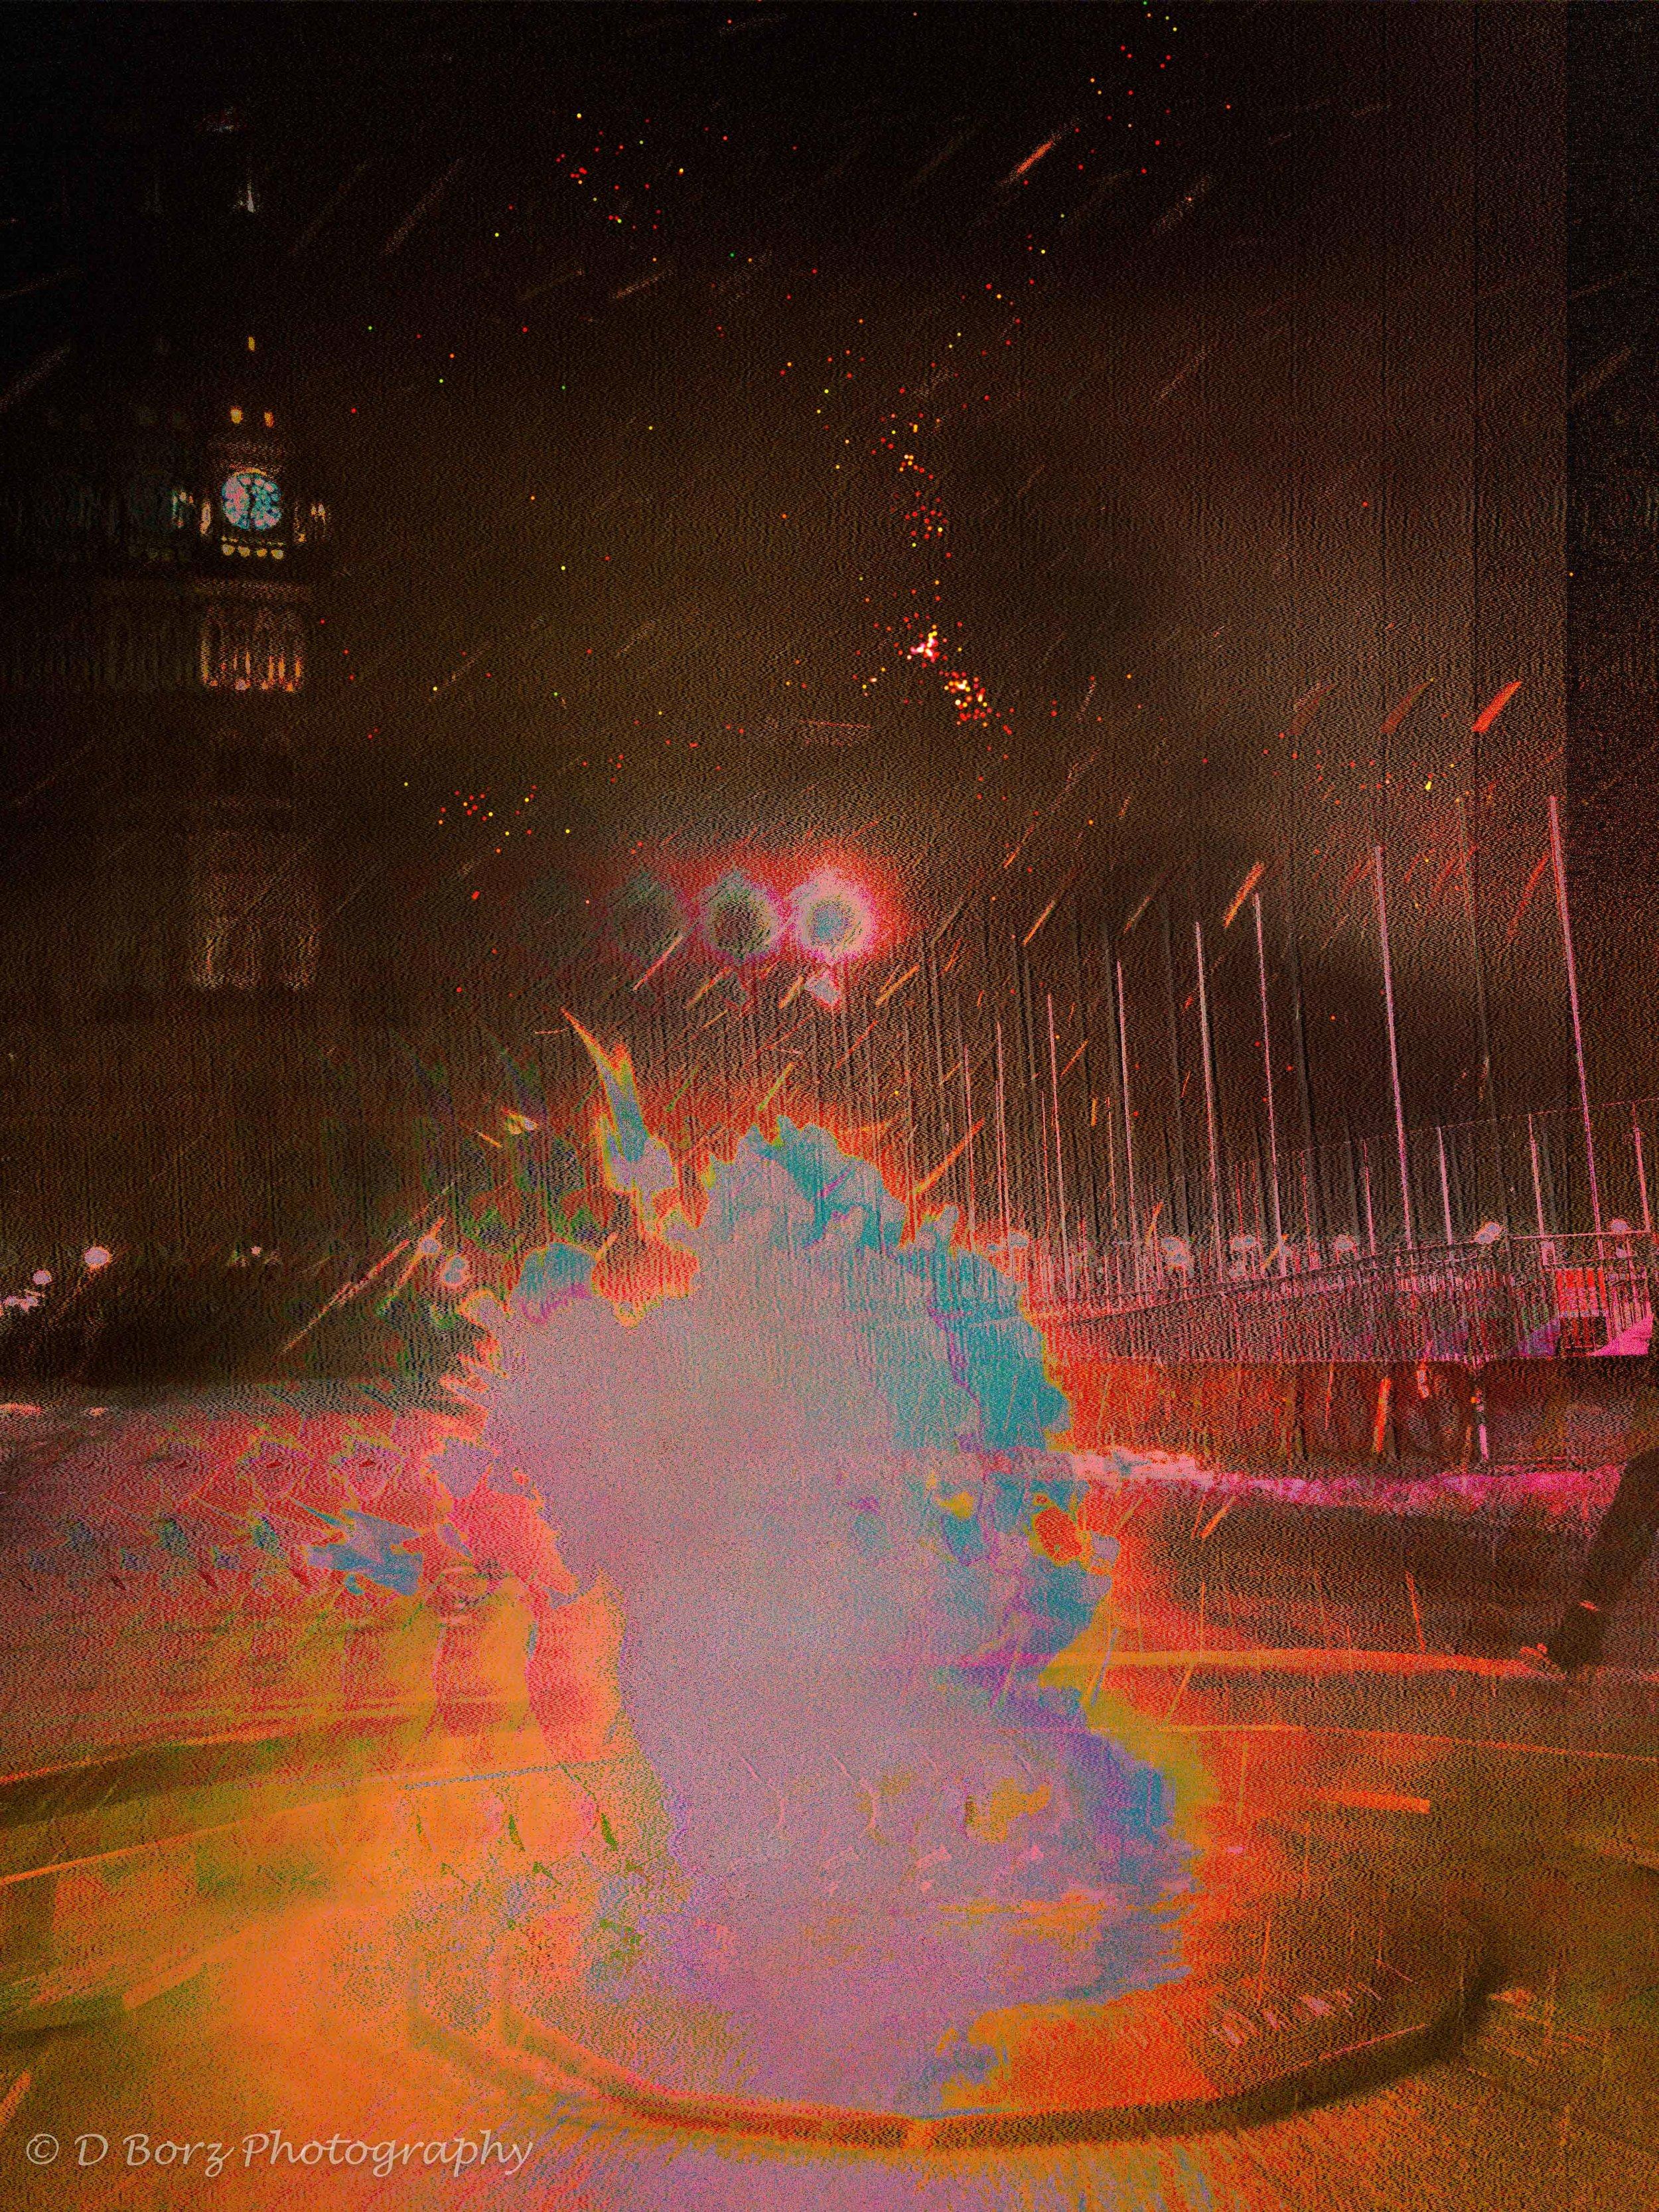 borzkowski_d_soundscape-2.jpg